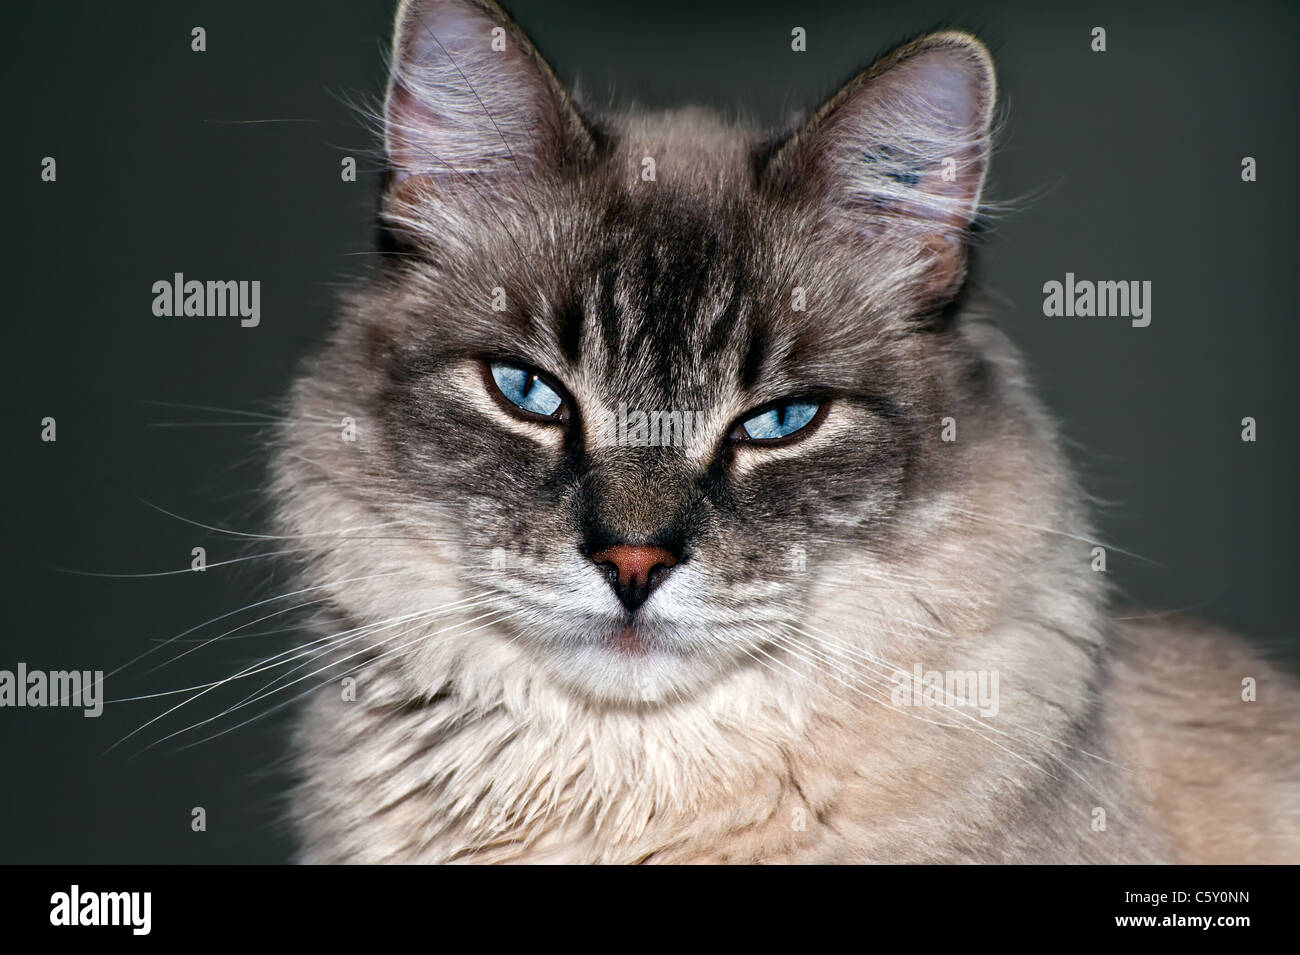 Cute pure breeder cat portrait in studio - Stock Image